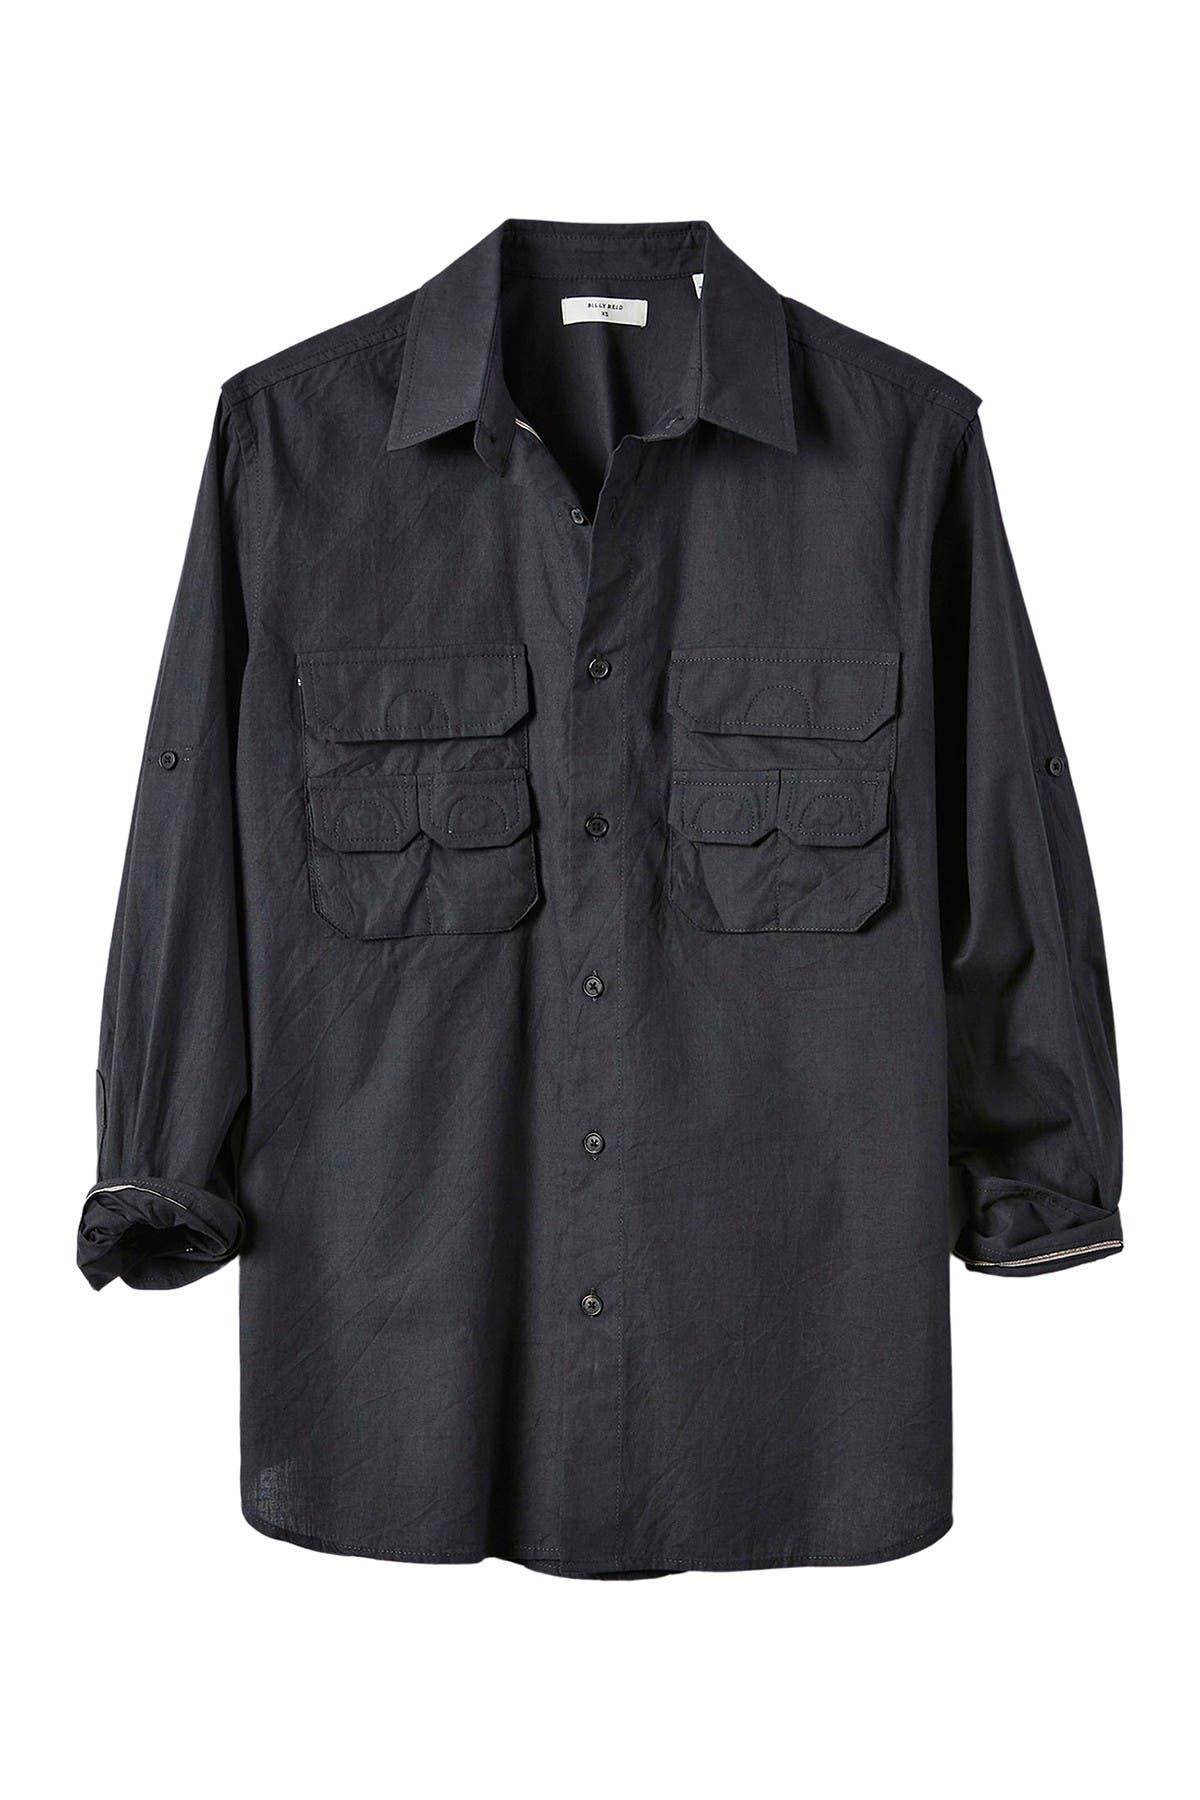 Image of Billy Reid Selvage Fisherman Shirt